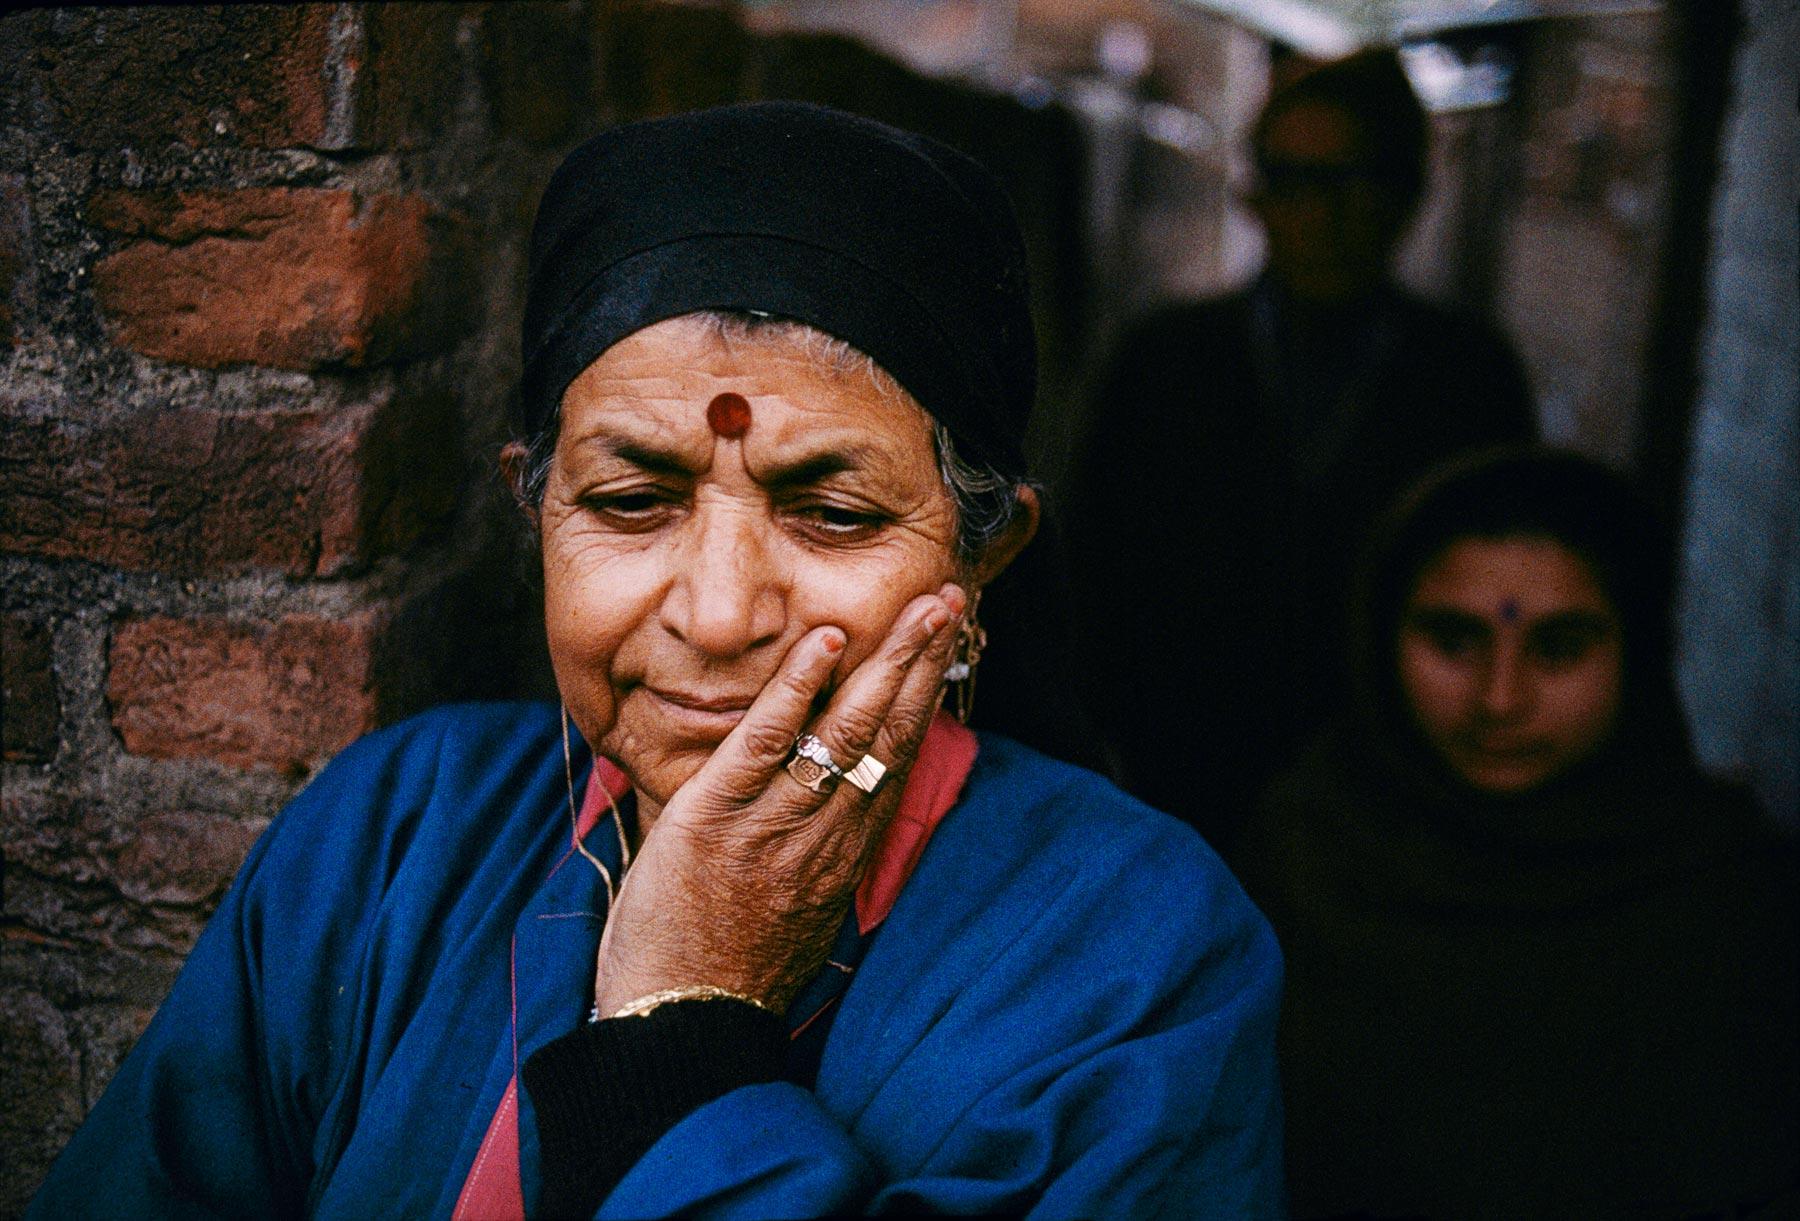 Steve McCurry  Kasmir  Hunting Faces  Pinterest